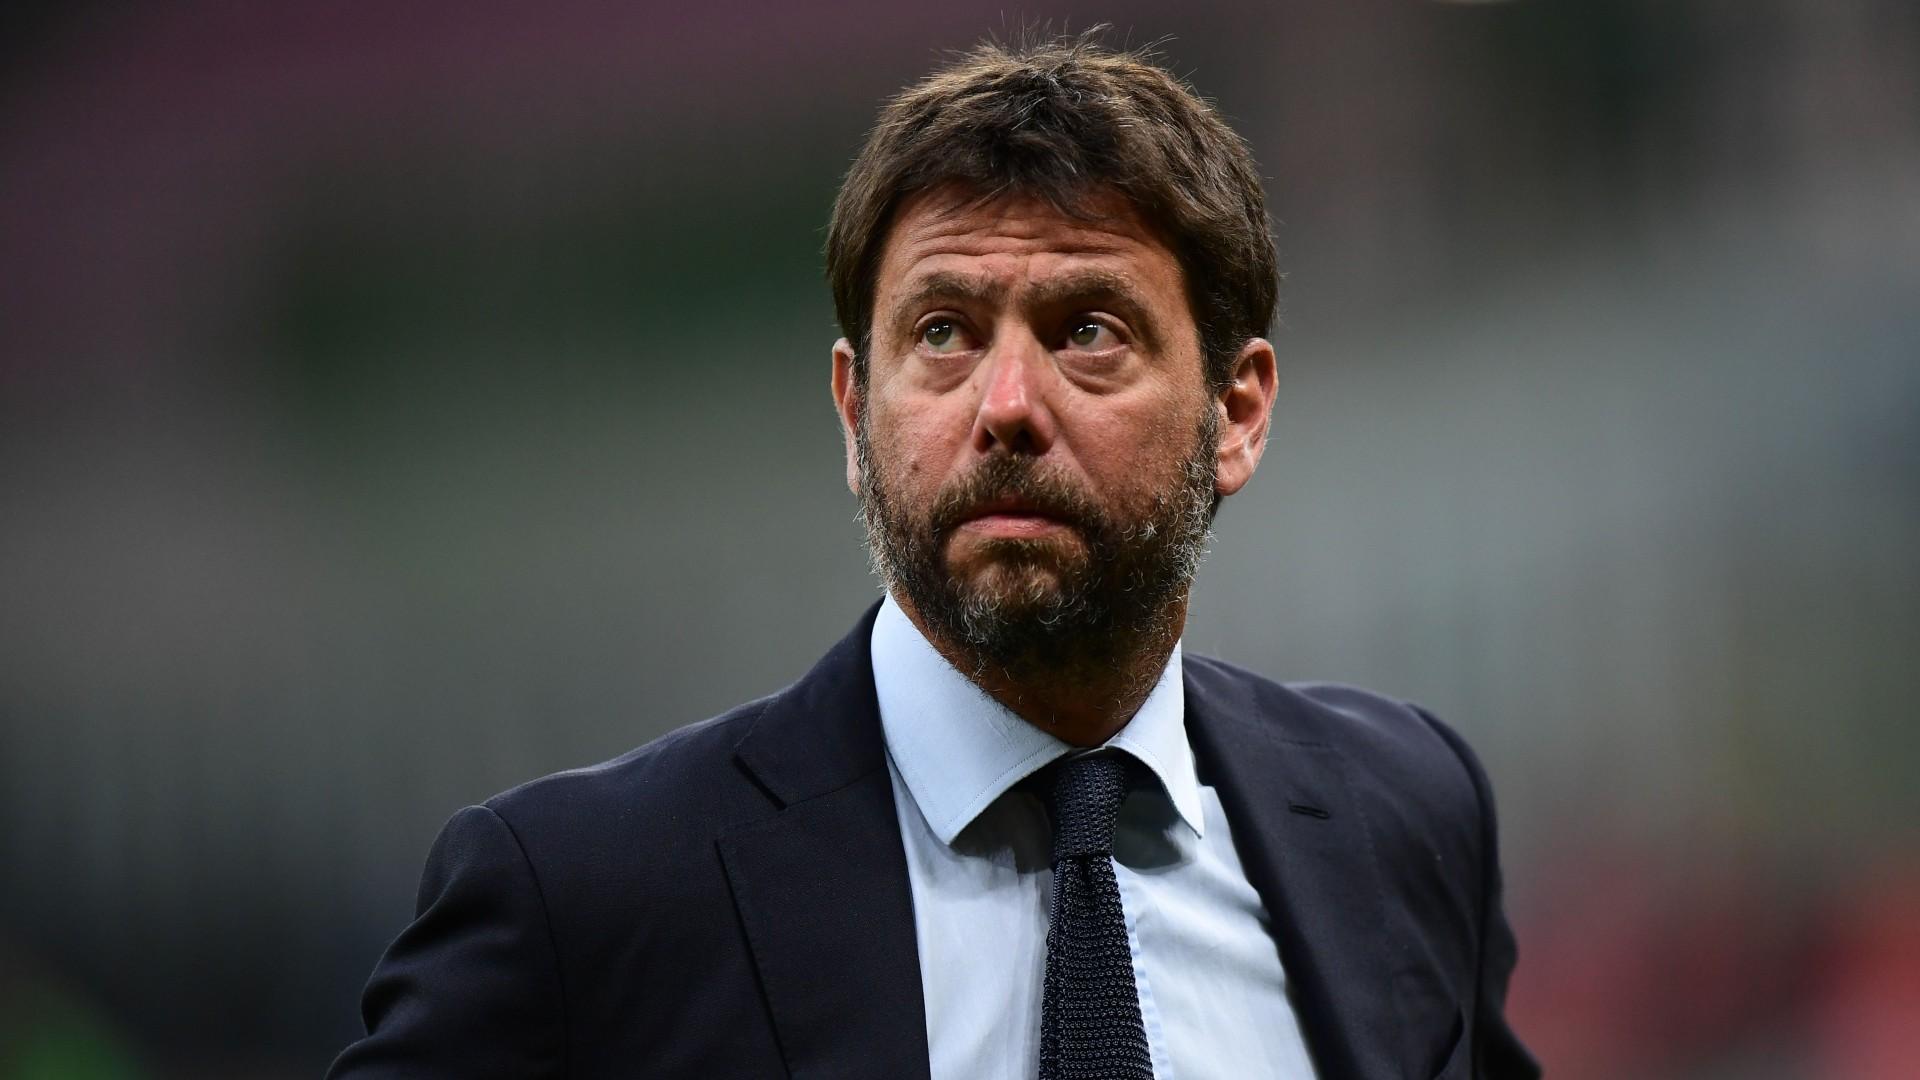 Liga Super Eropa Kandas, Andrea Agnelli Mundur Sebagai Presiden Juventus   Goal.com